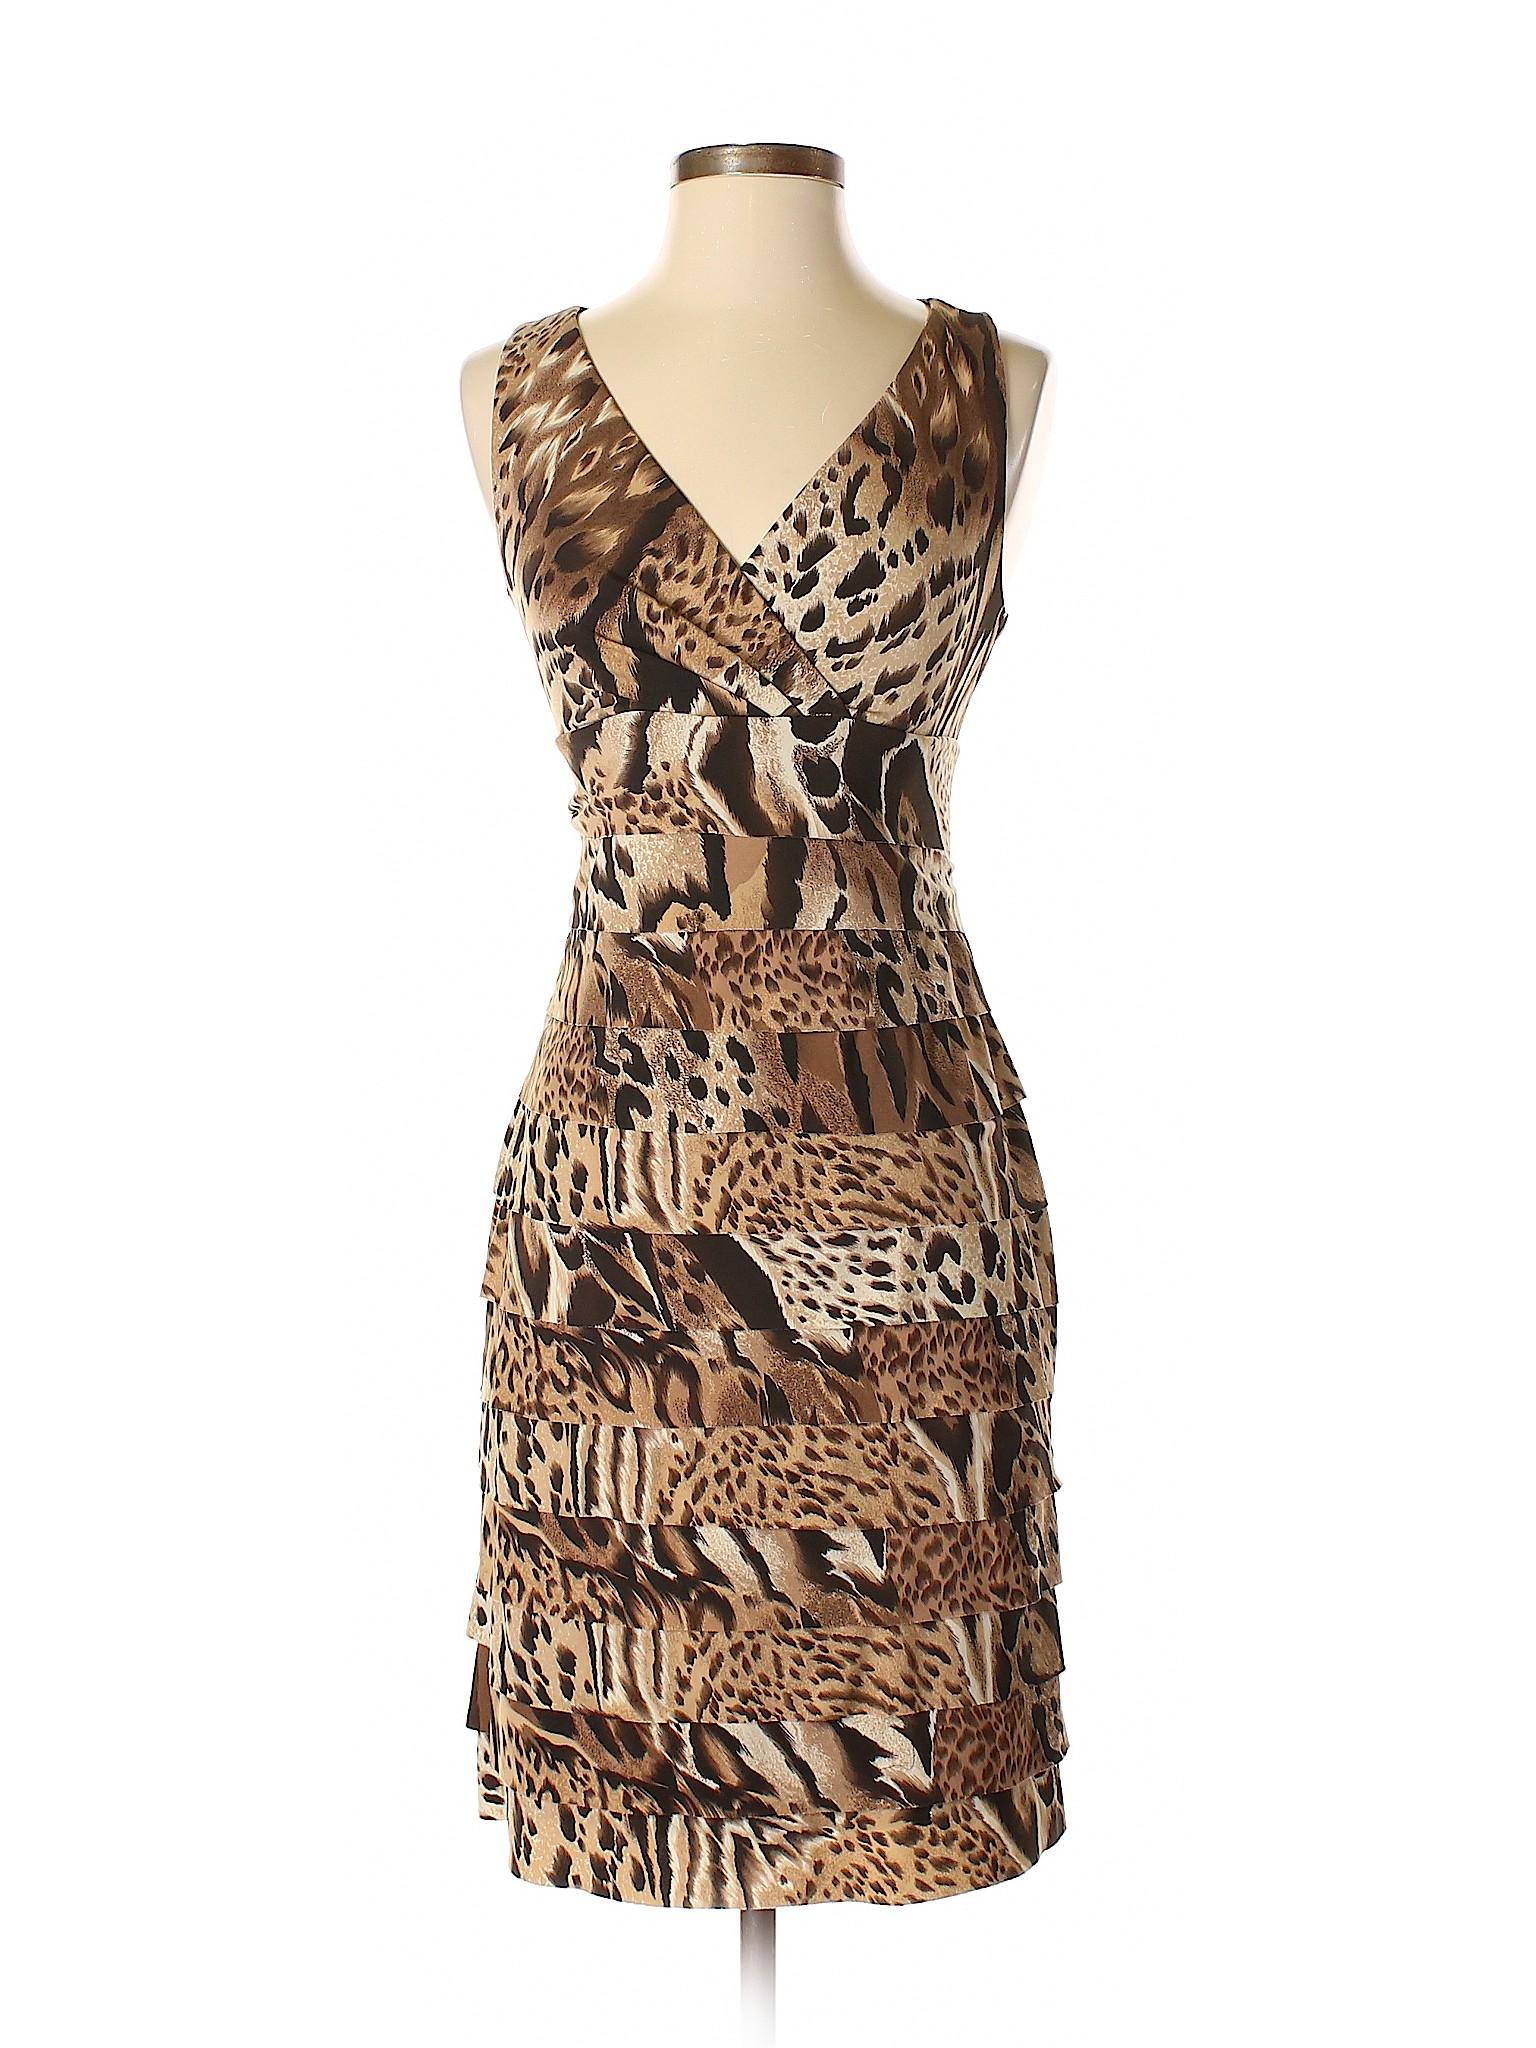 Casual winter Boutique Dress Sandra Darren txHw8Hg